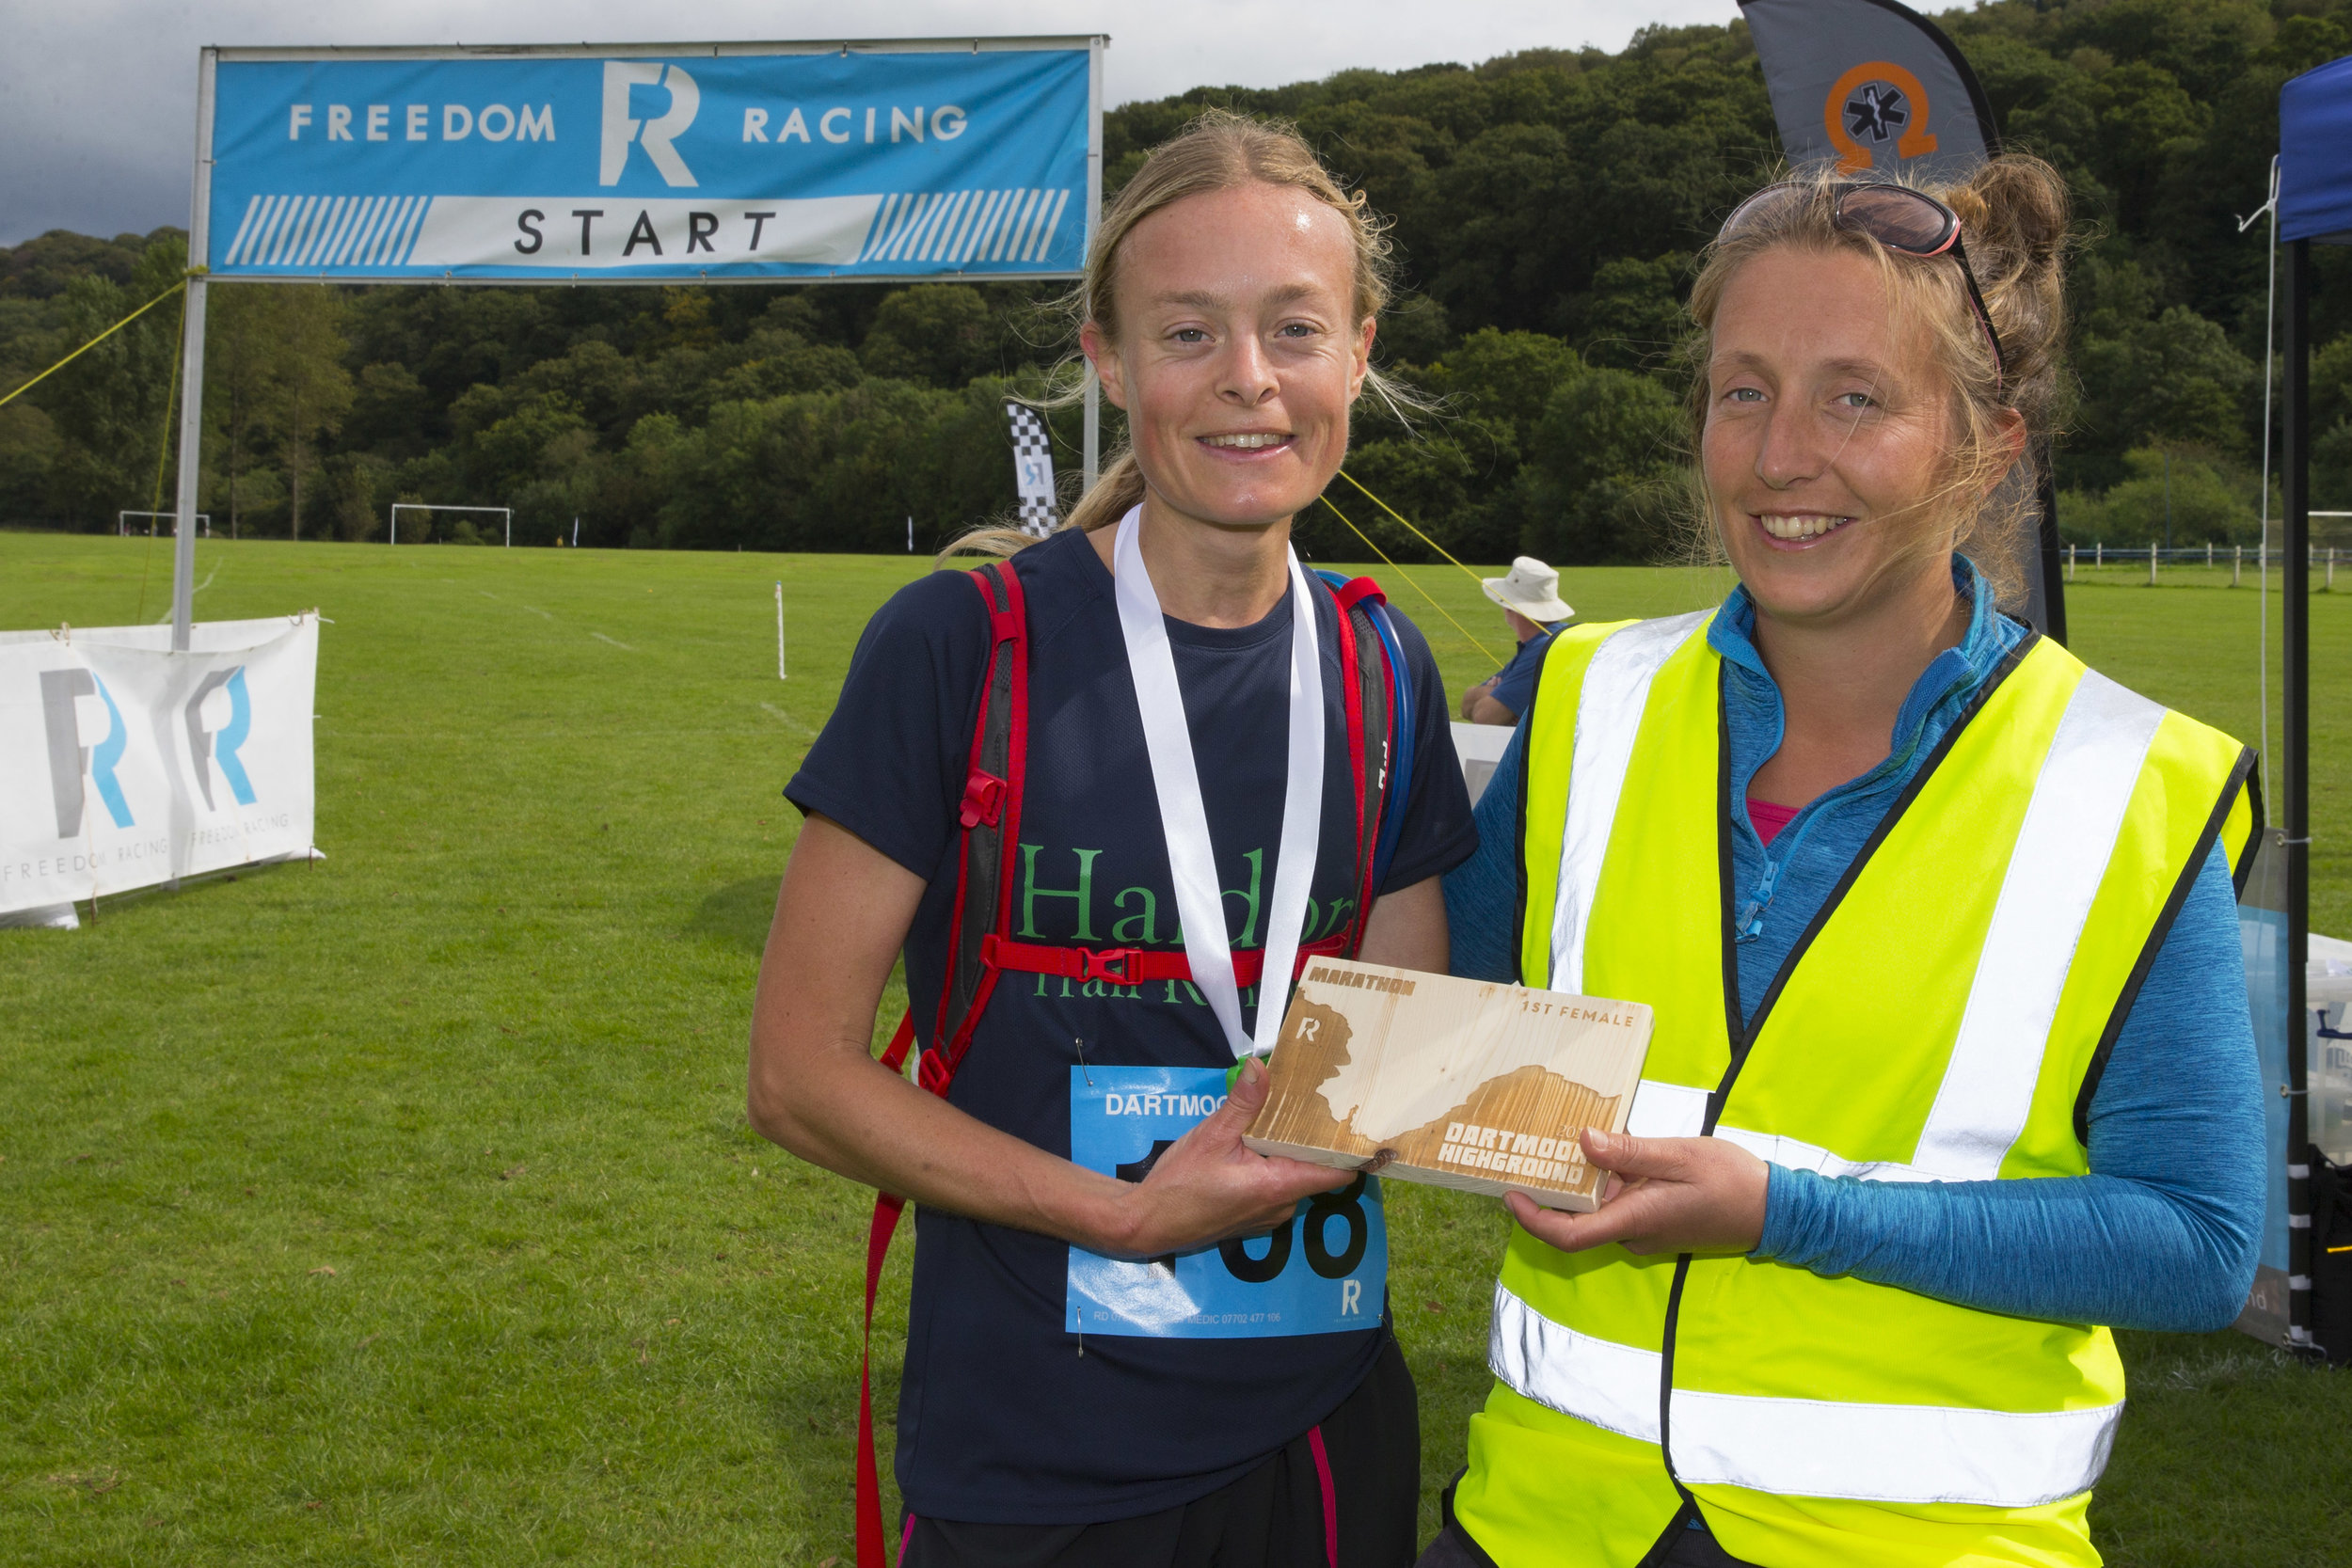 Female winner of the Dartmoor Marathon